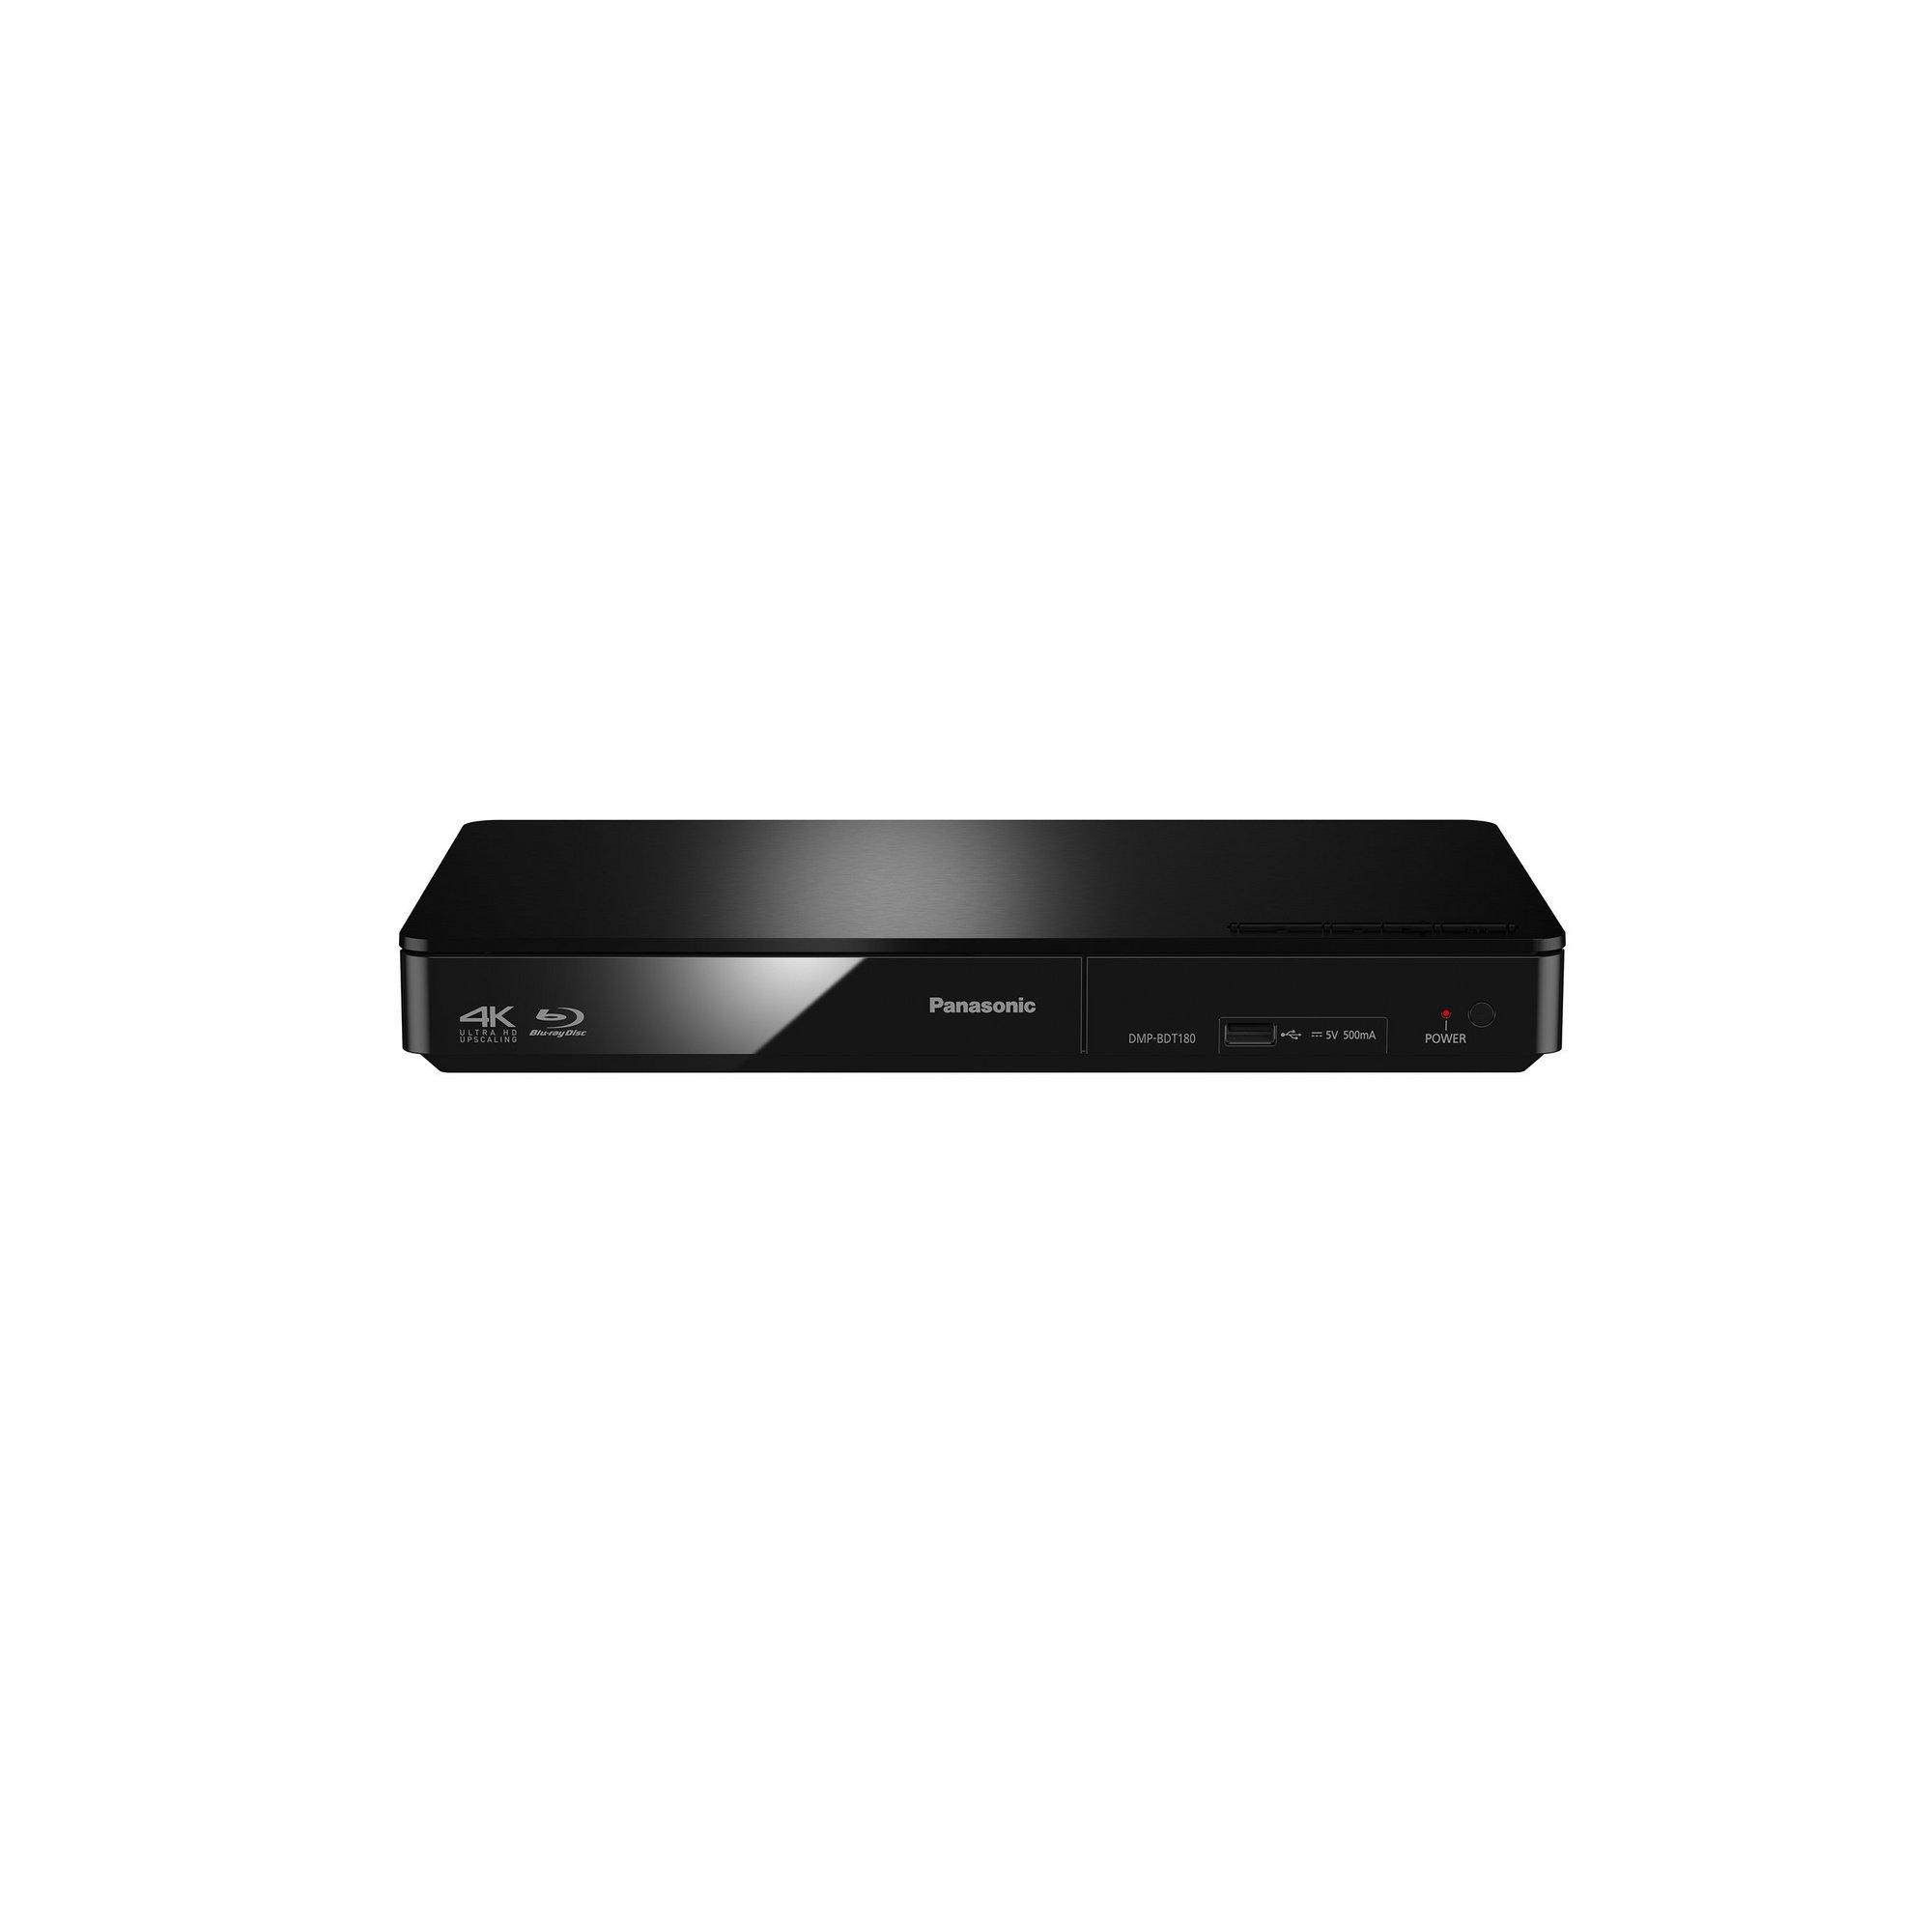 Image of Panasonic Smart Network 3D Blu Ray Disc DVD Player